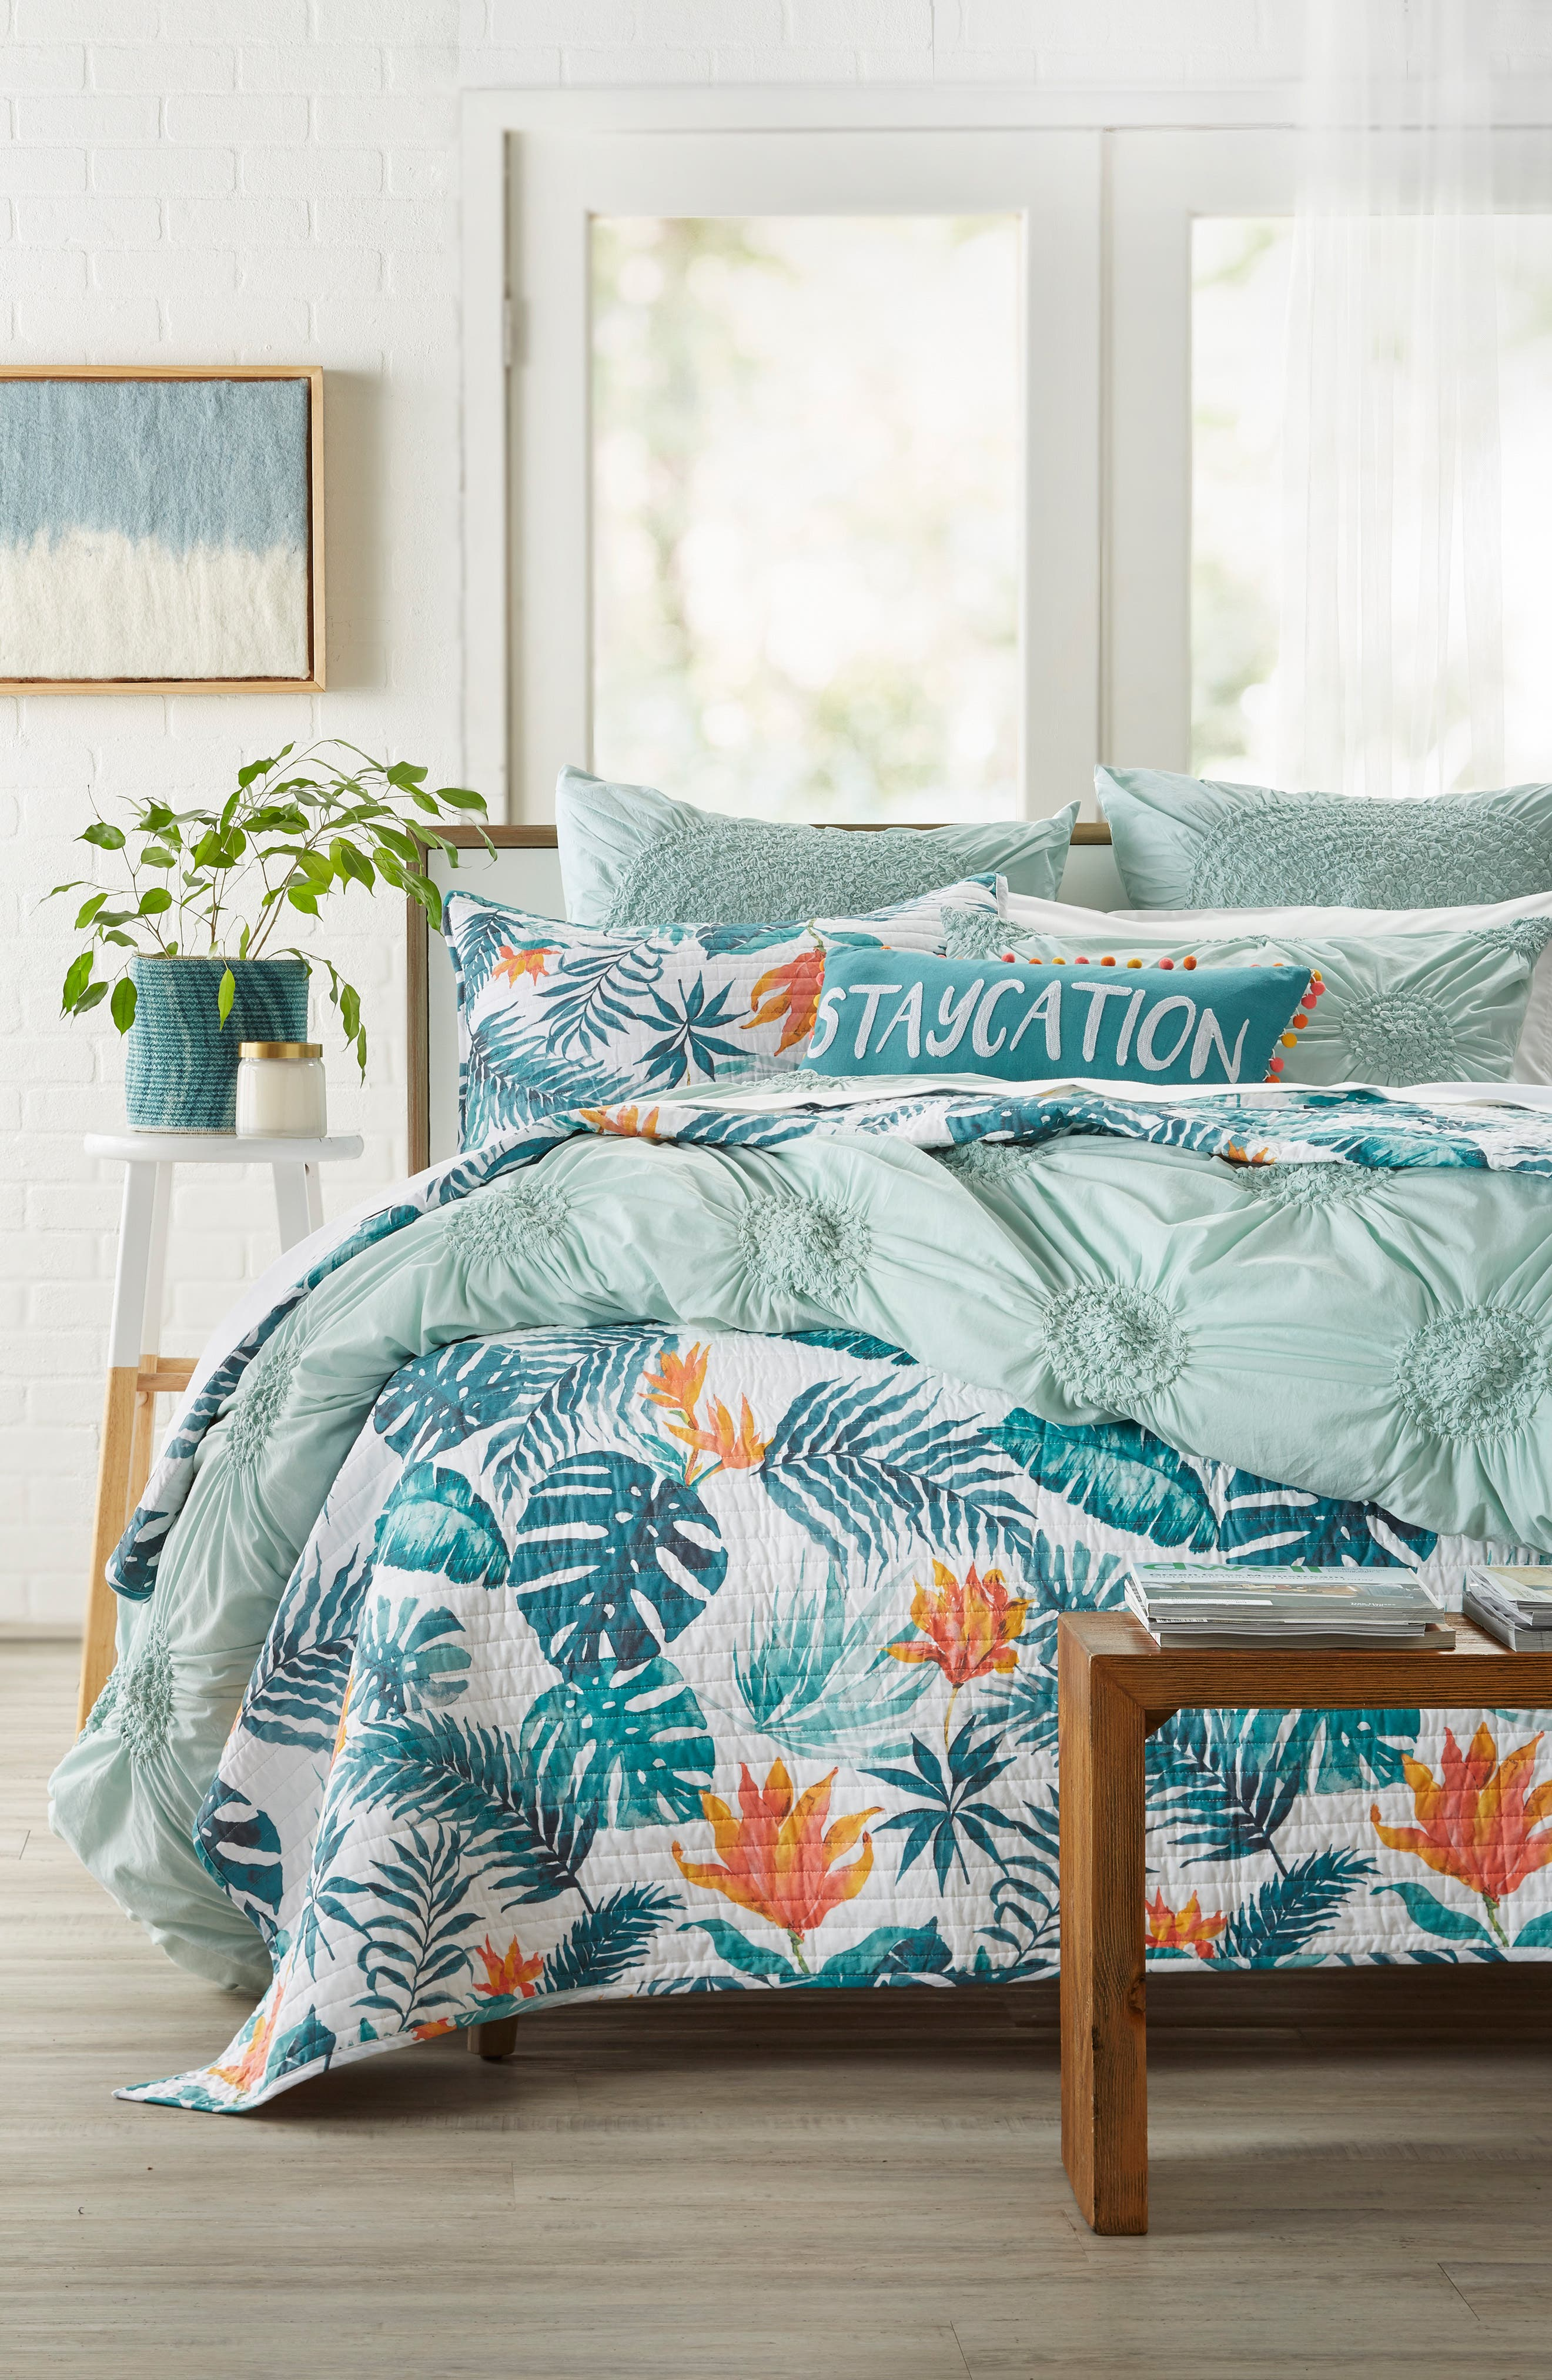 Carmen Staycation Accent Pillow,                             Alternate thumbnail 2, color,                             Blue